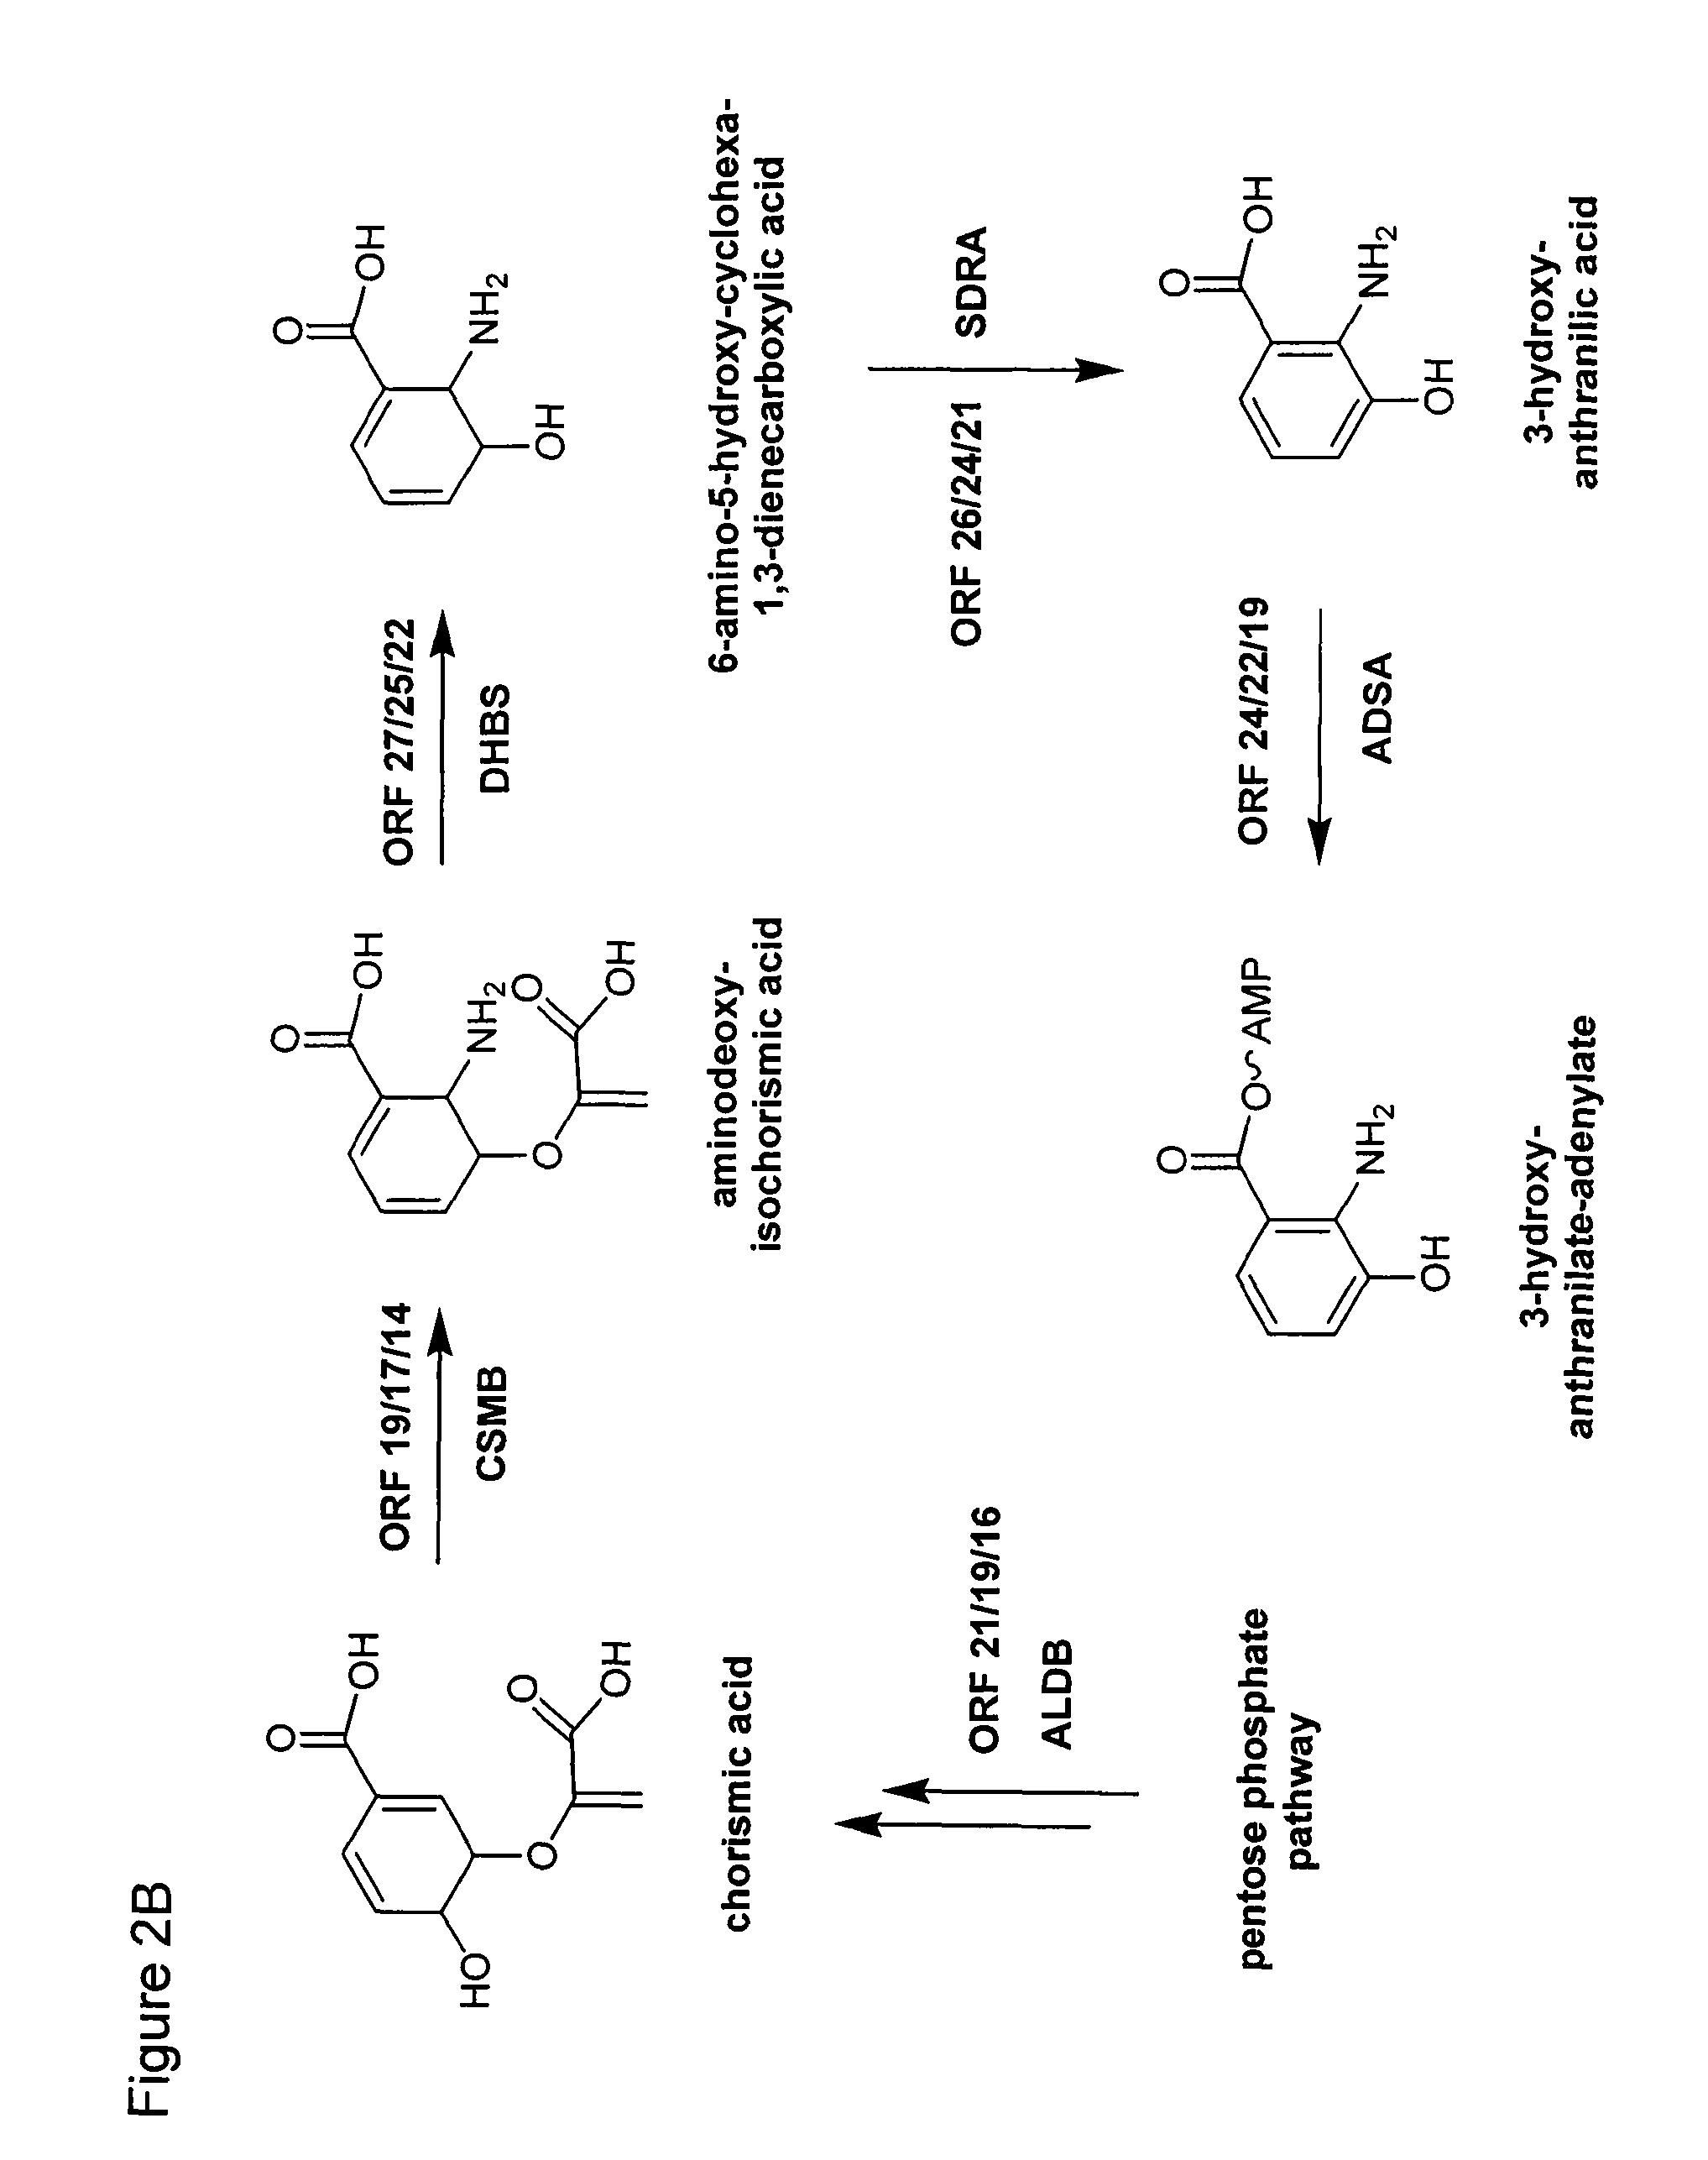 US8361759B2 - Process for producing farnesylated